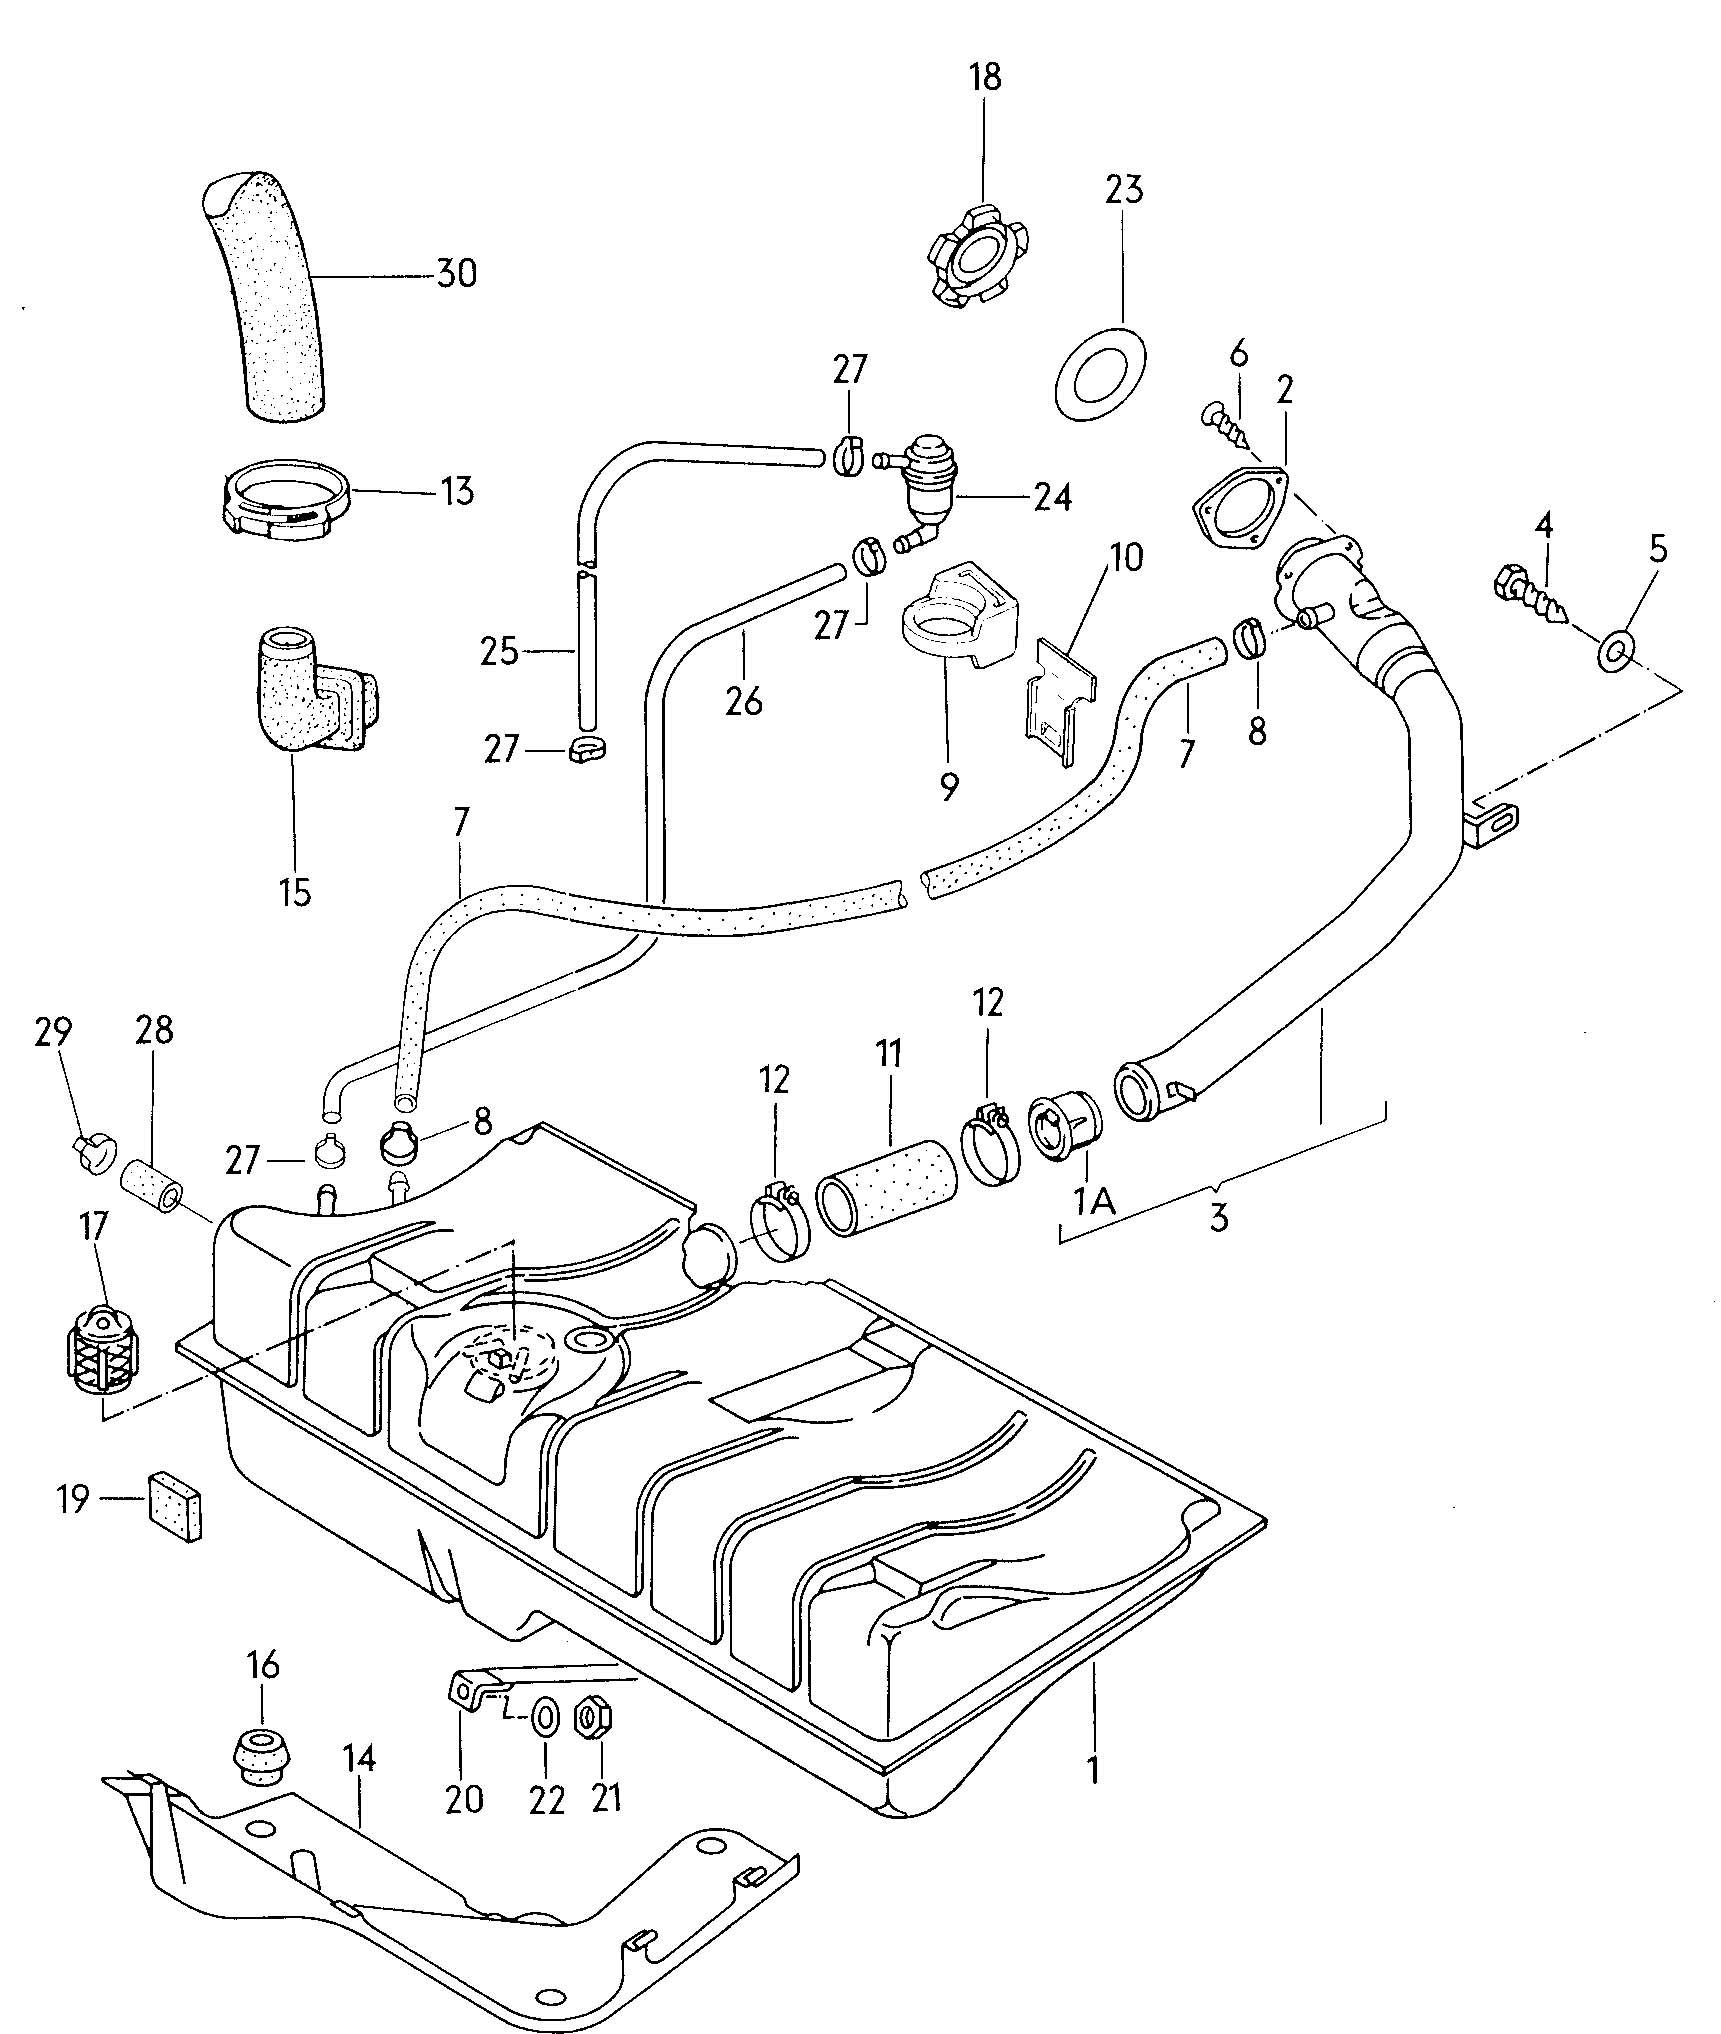 1981 Volkswagen PickUp Fuel tank gravity valve vent hose